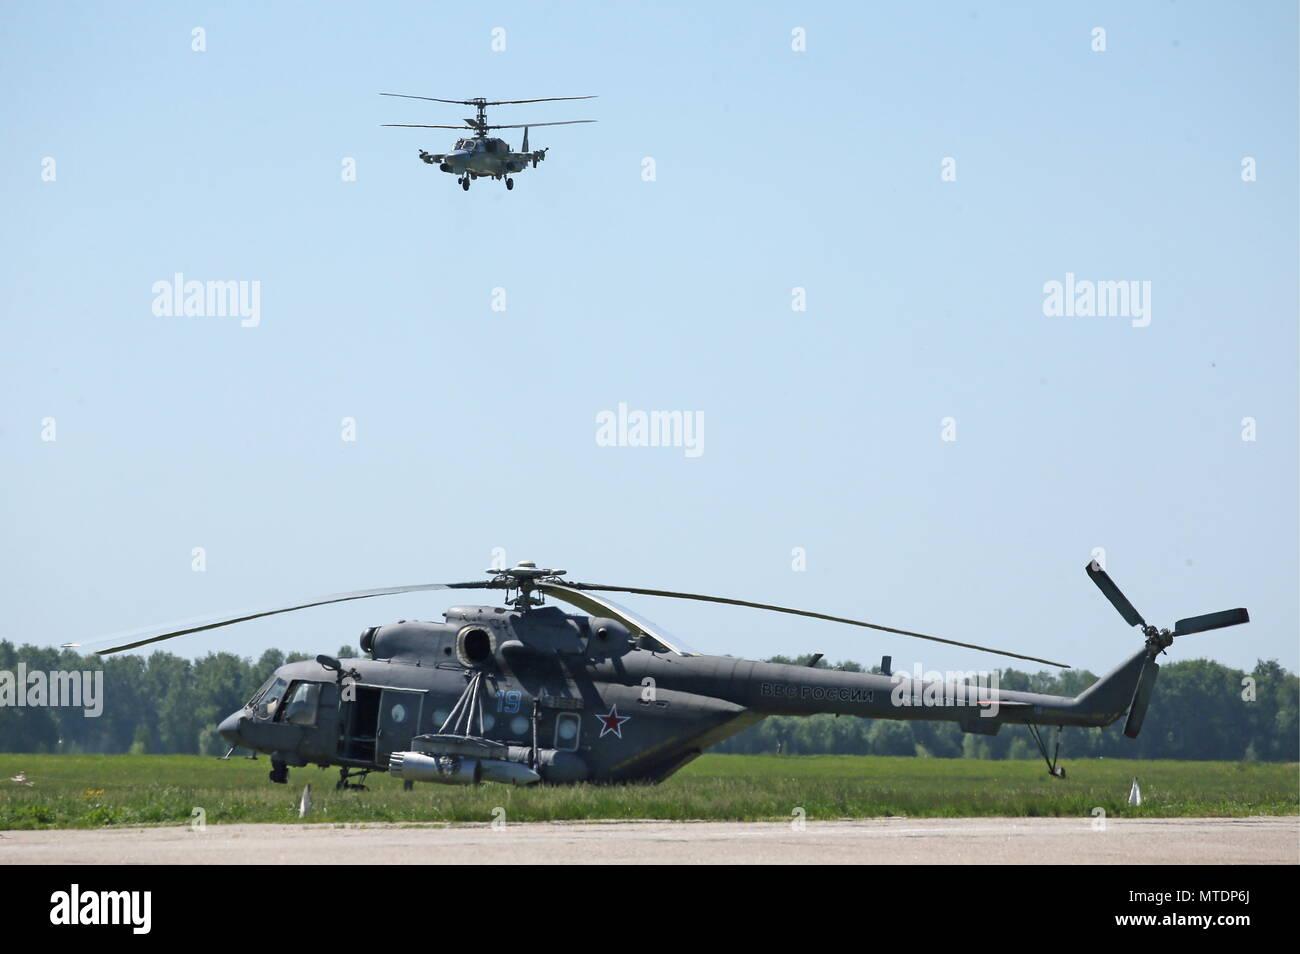 Mi-8AMTSH - Terminator from Russia 24